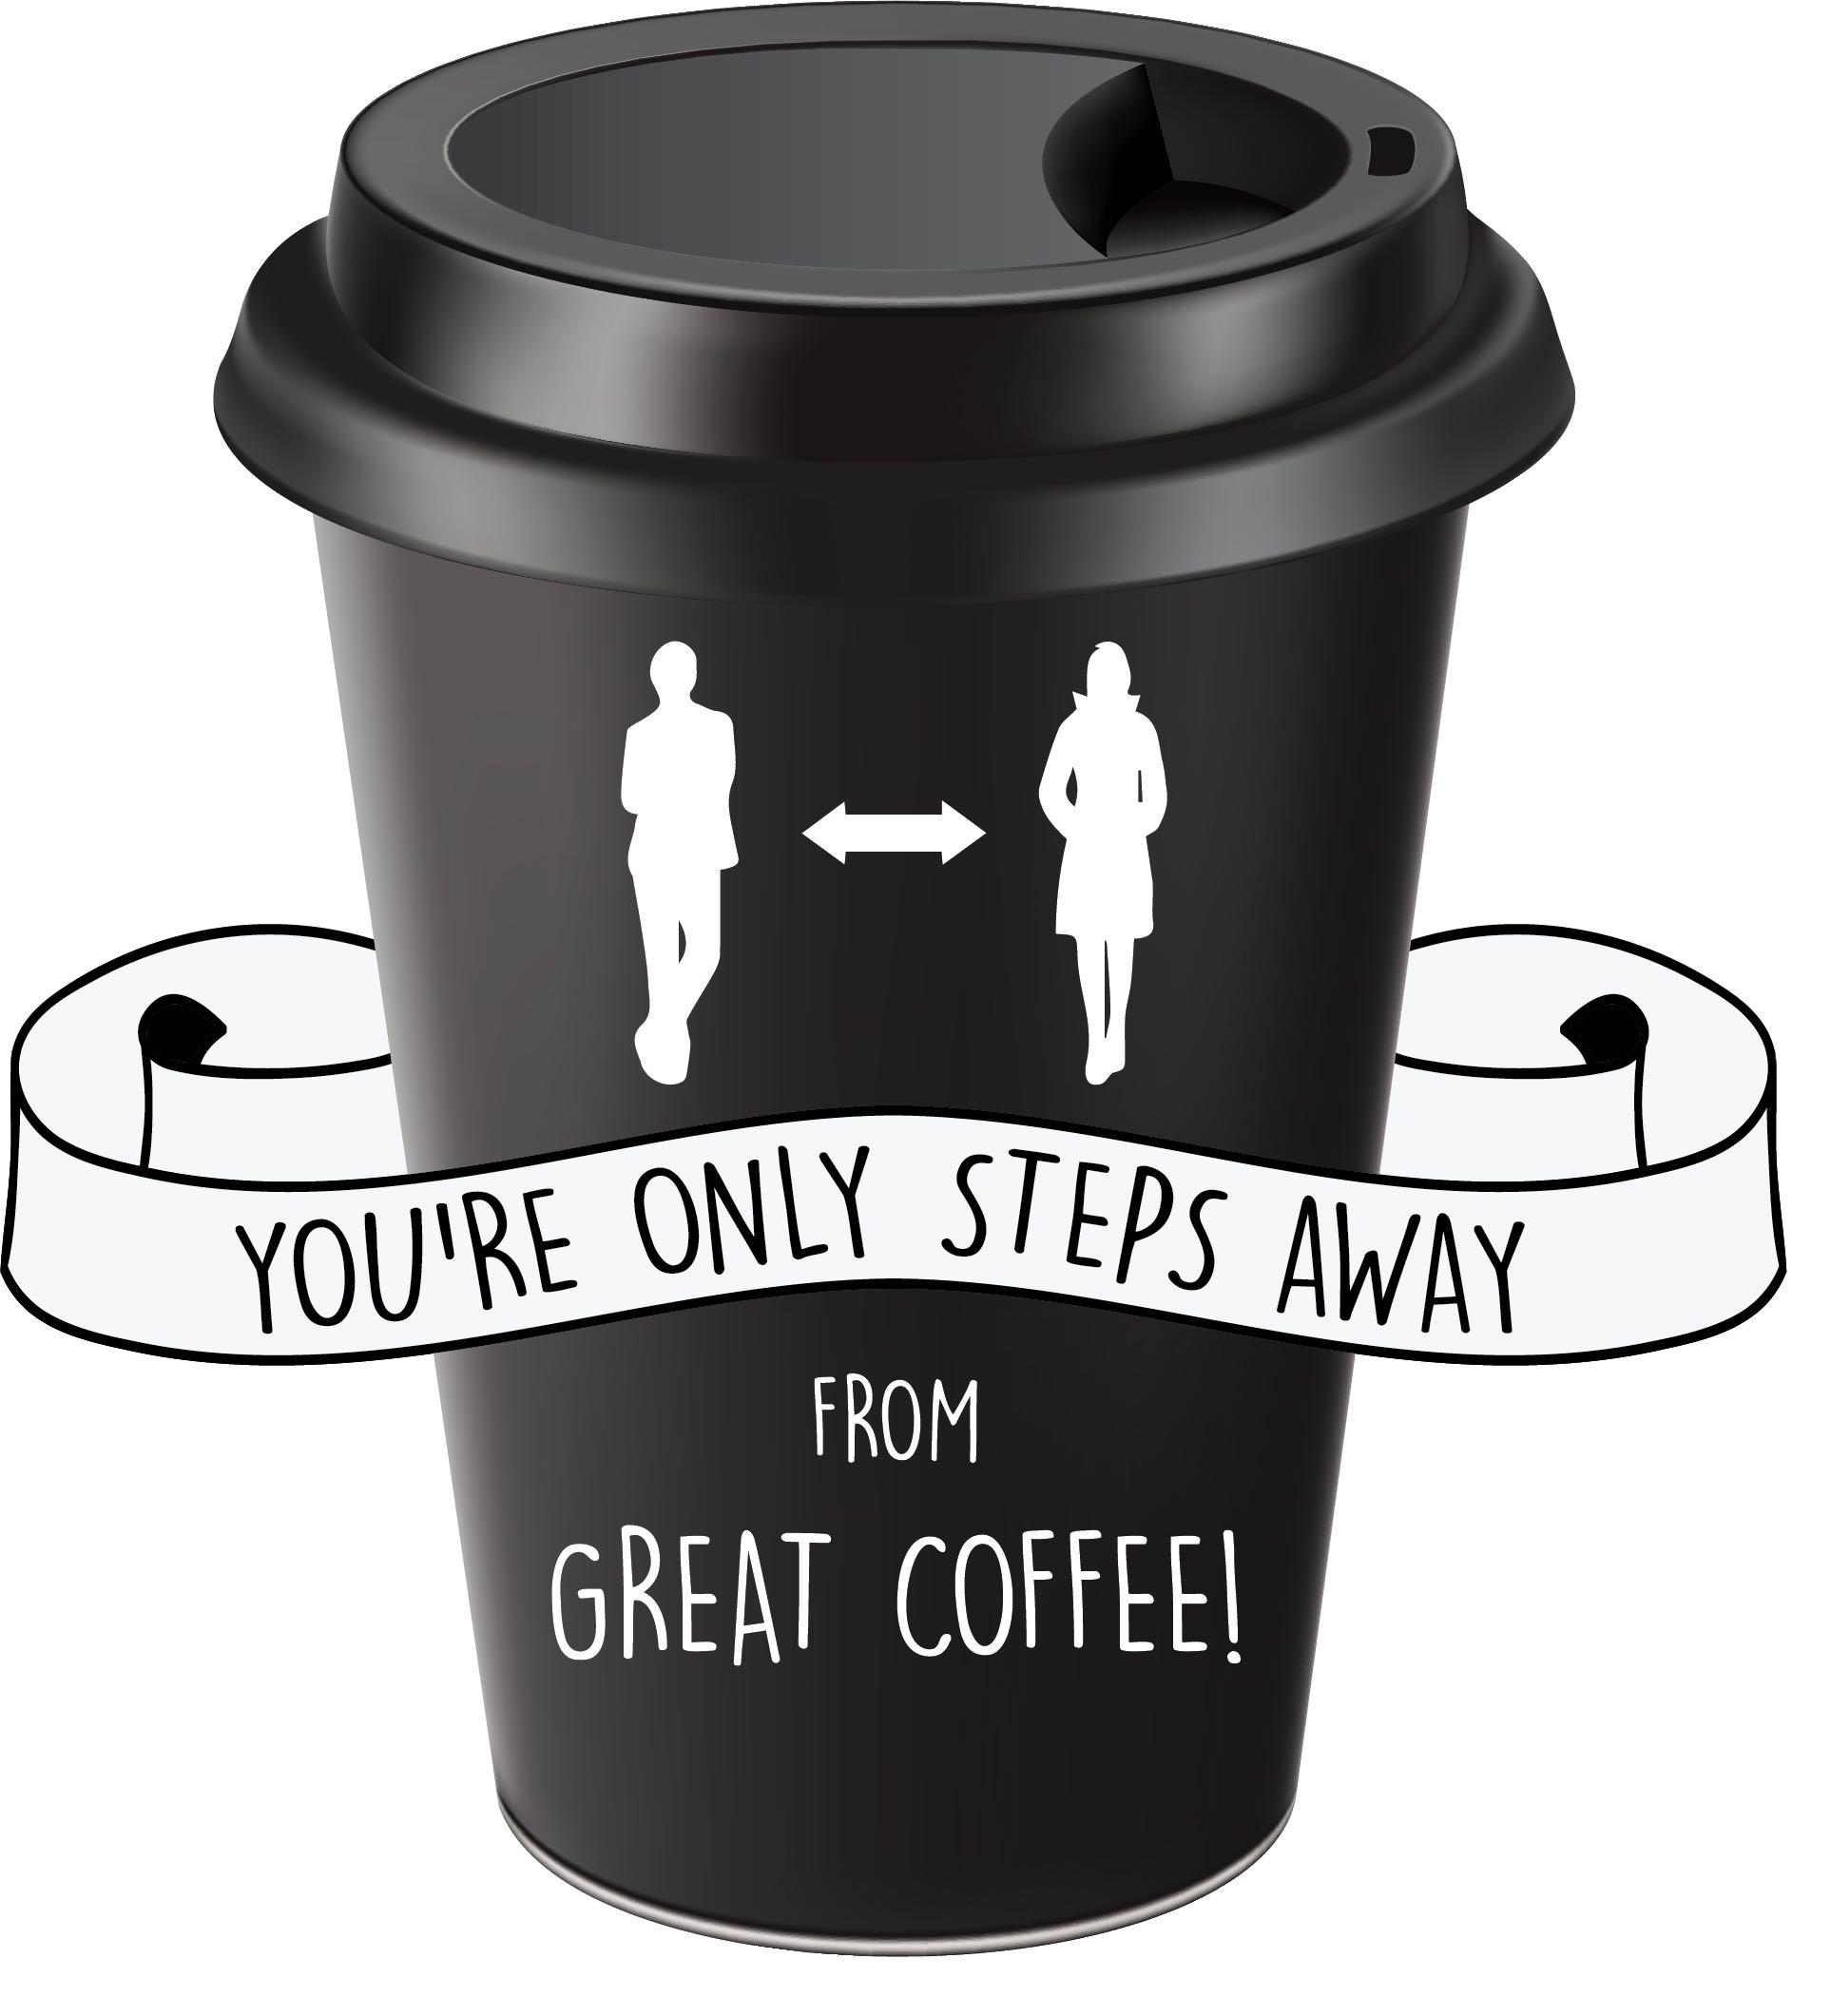 Coffee Cup Floor Decal Social Distancing